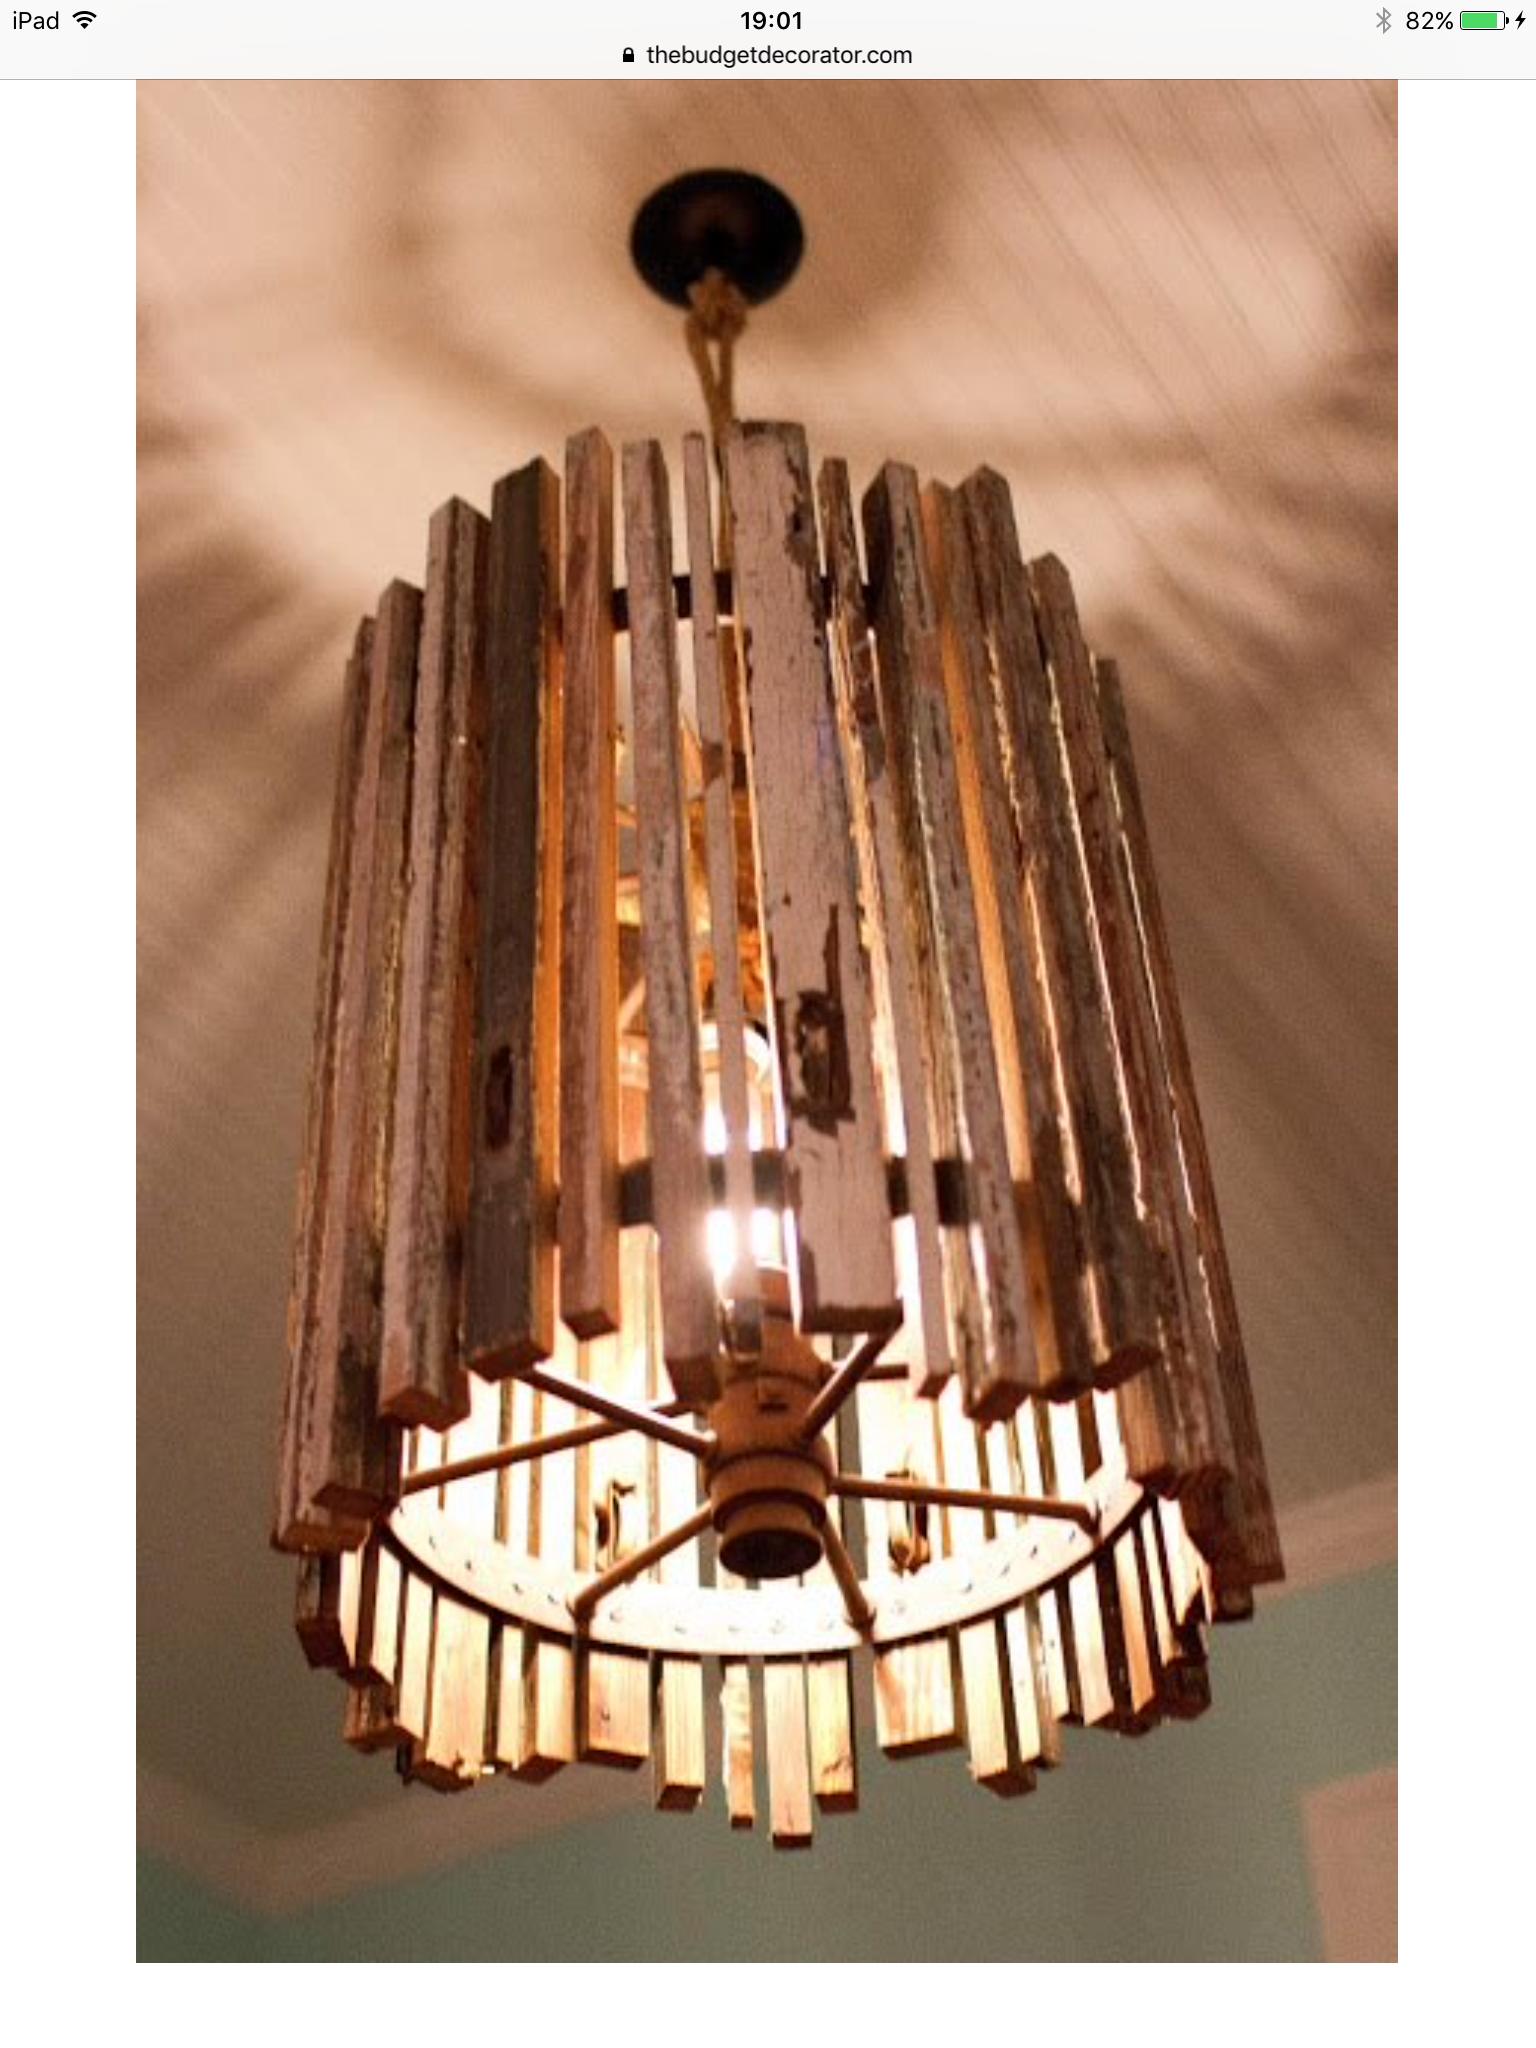 Pin By Dromomaniac On Lighting Diy Pendant Light Wood Light Fixture Handmade Lighting